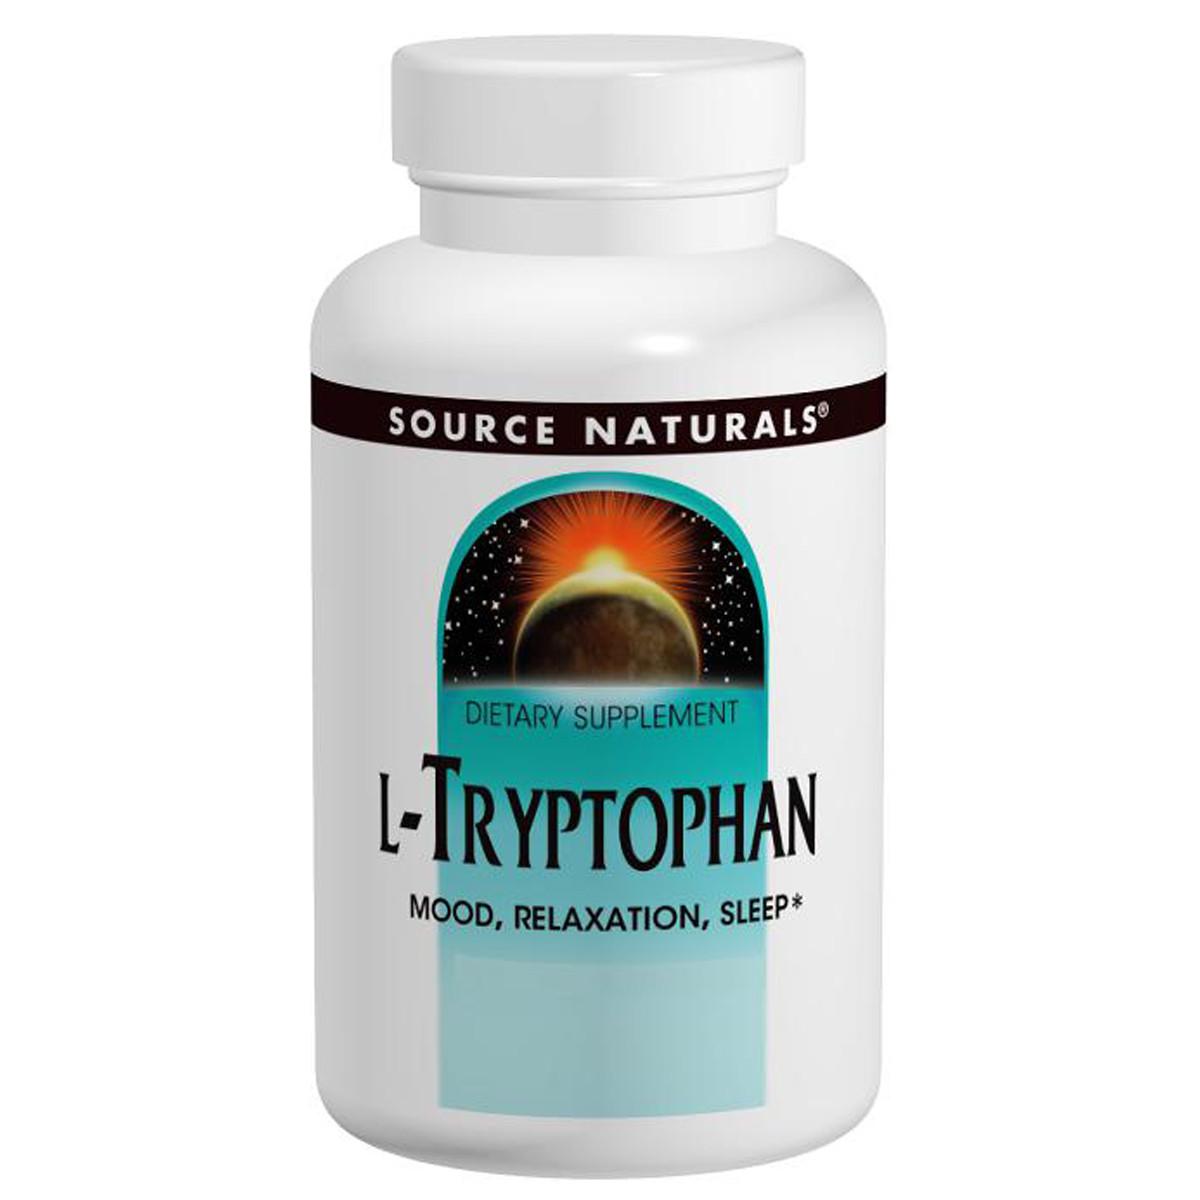 L-Триптофан, 500 мг, Source Naturals, 30 таблеток